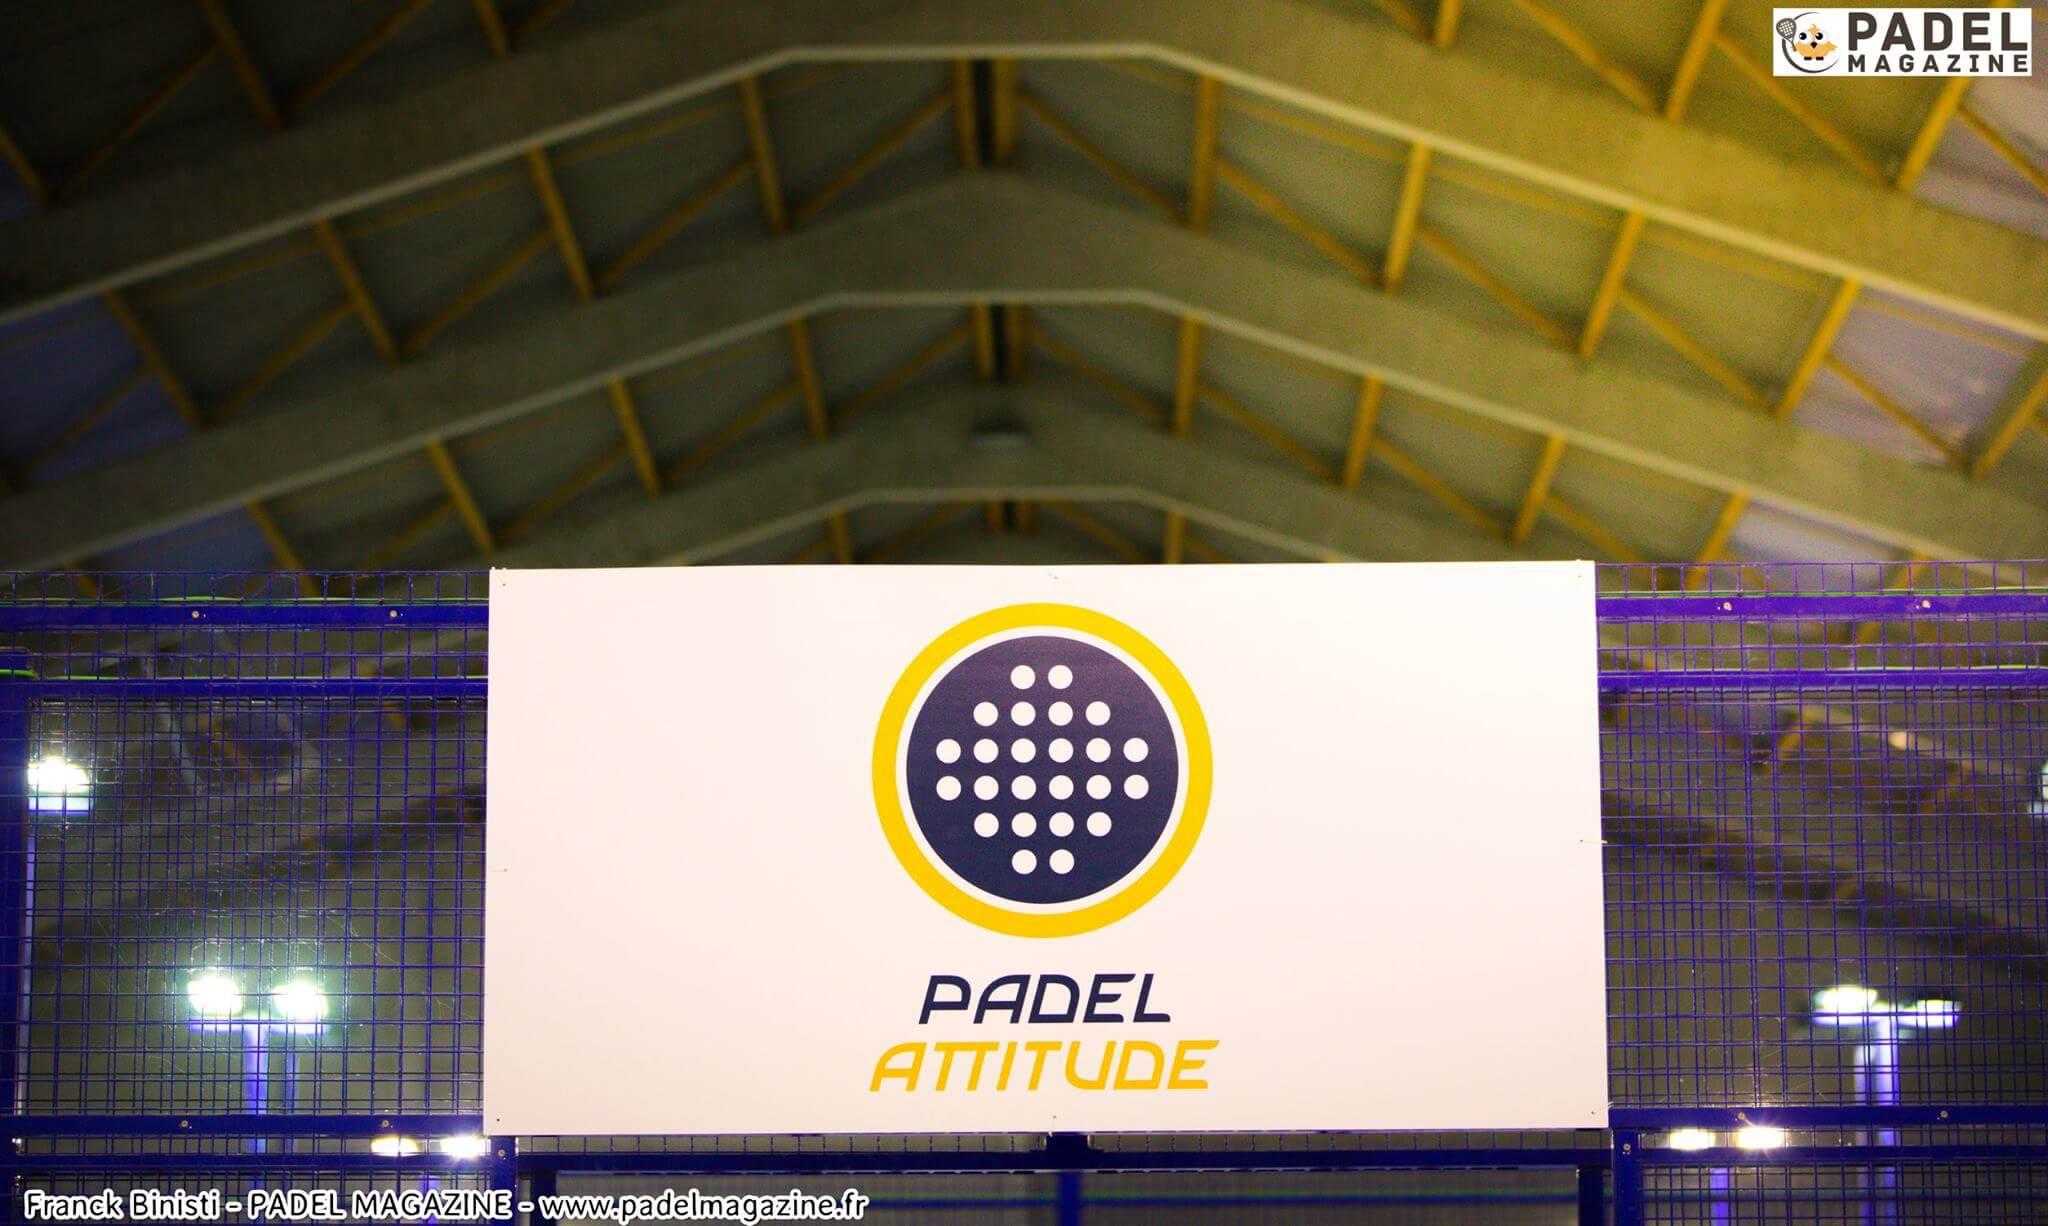 Padel attitude tournois de padel